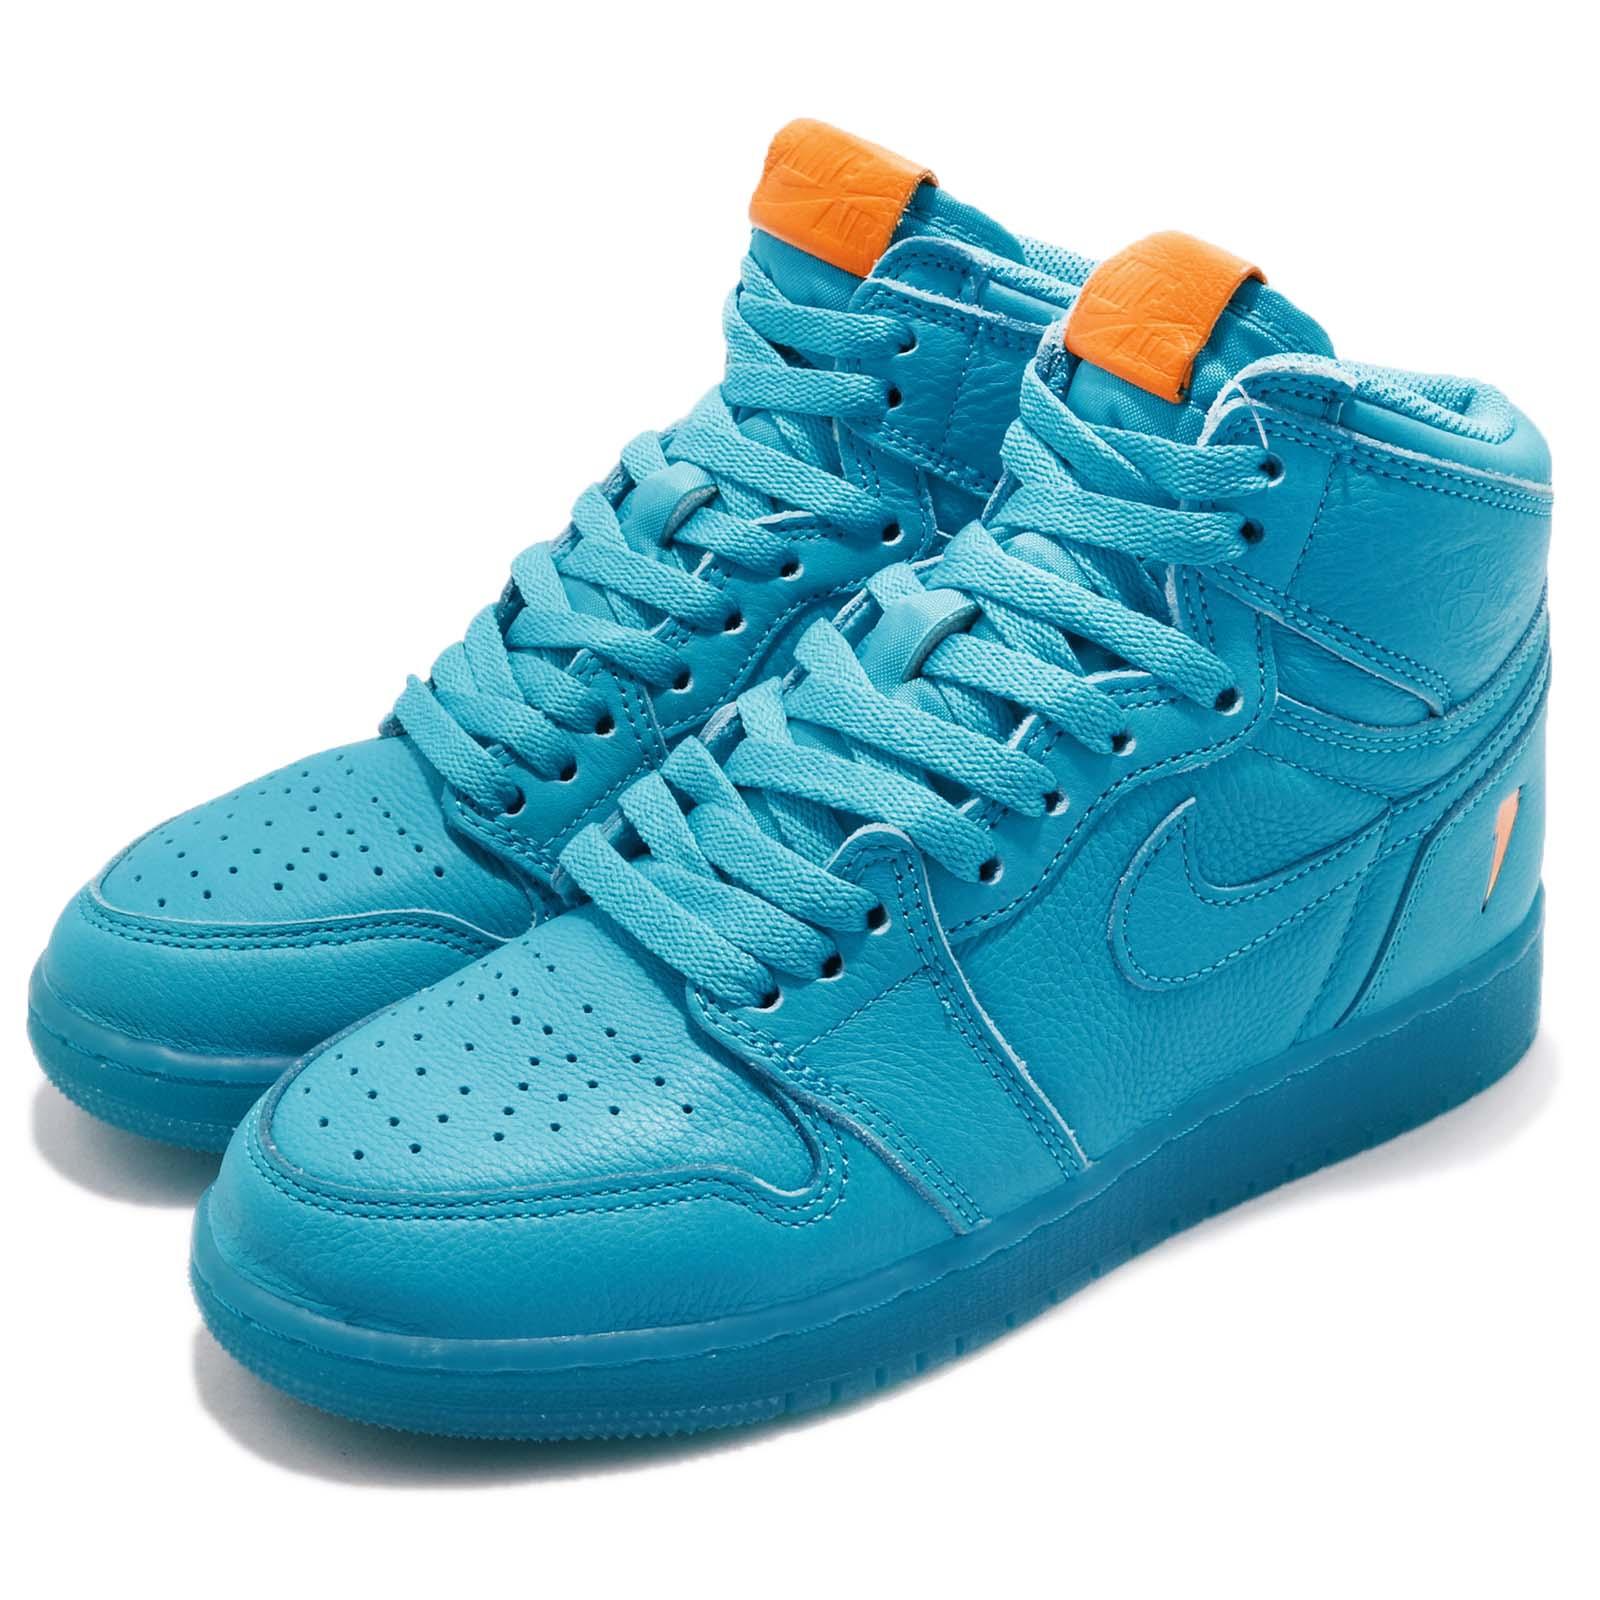 Nike 籃球鞋 Jordan 1 RET 運動 女鞋 AJ6000-455